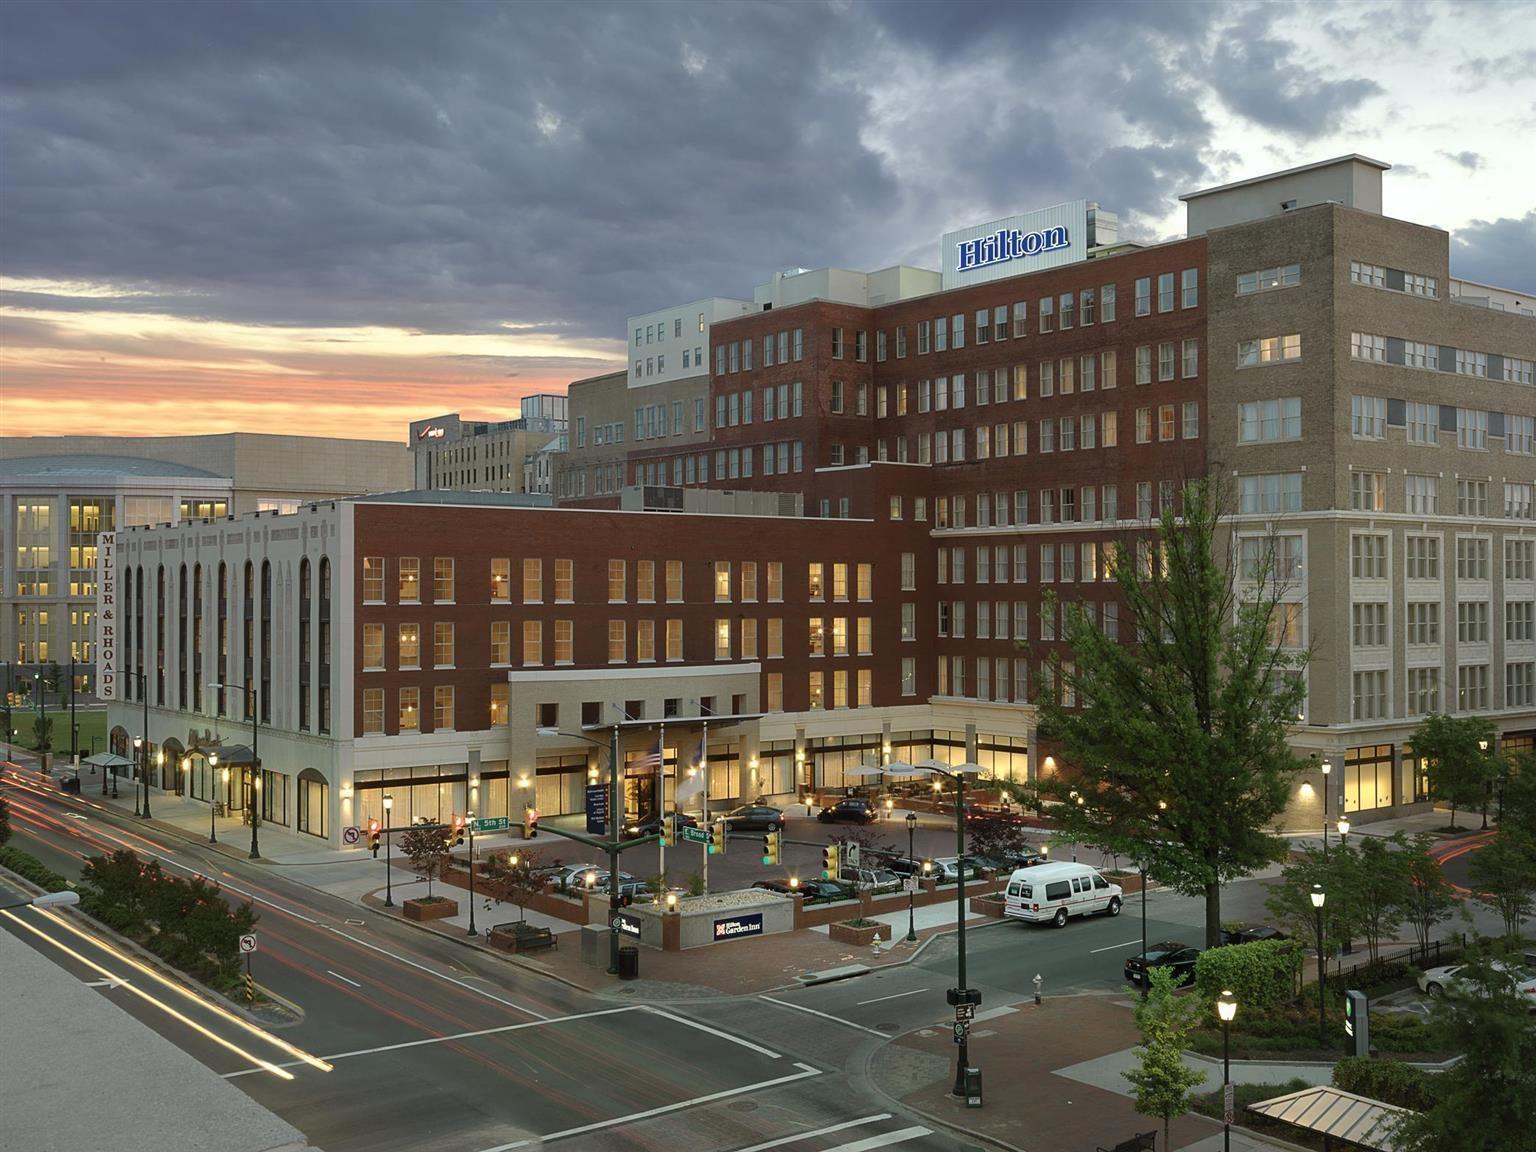 Richmond (VA) Hilton Richmond Downtown United States, North America ...